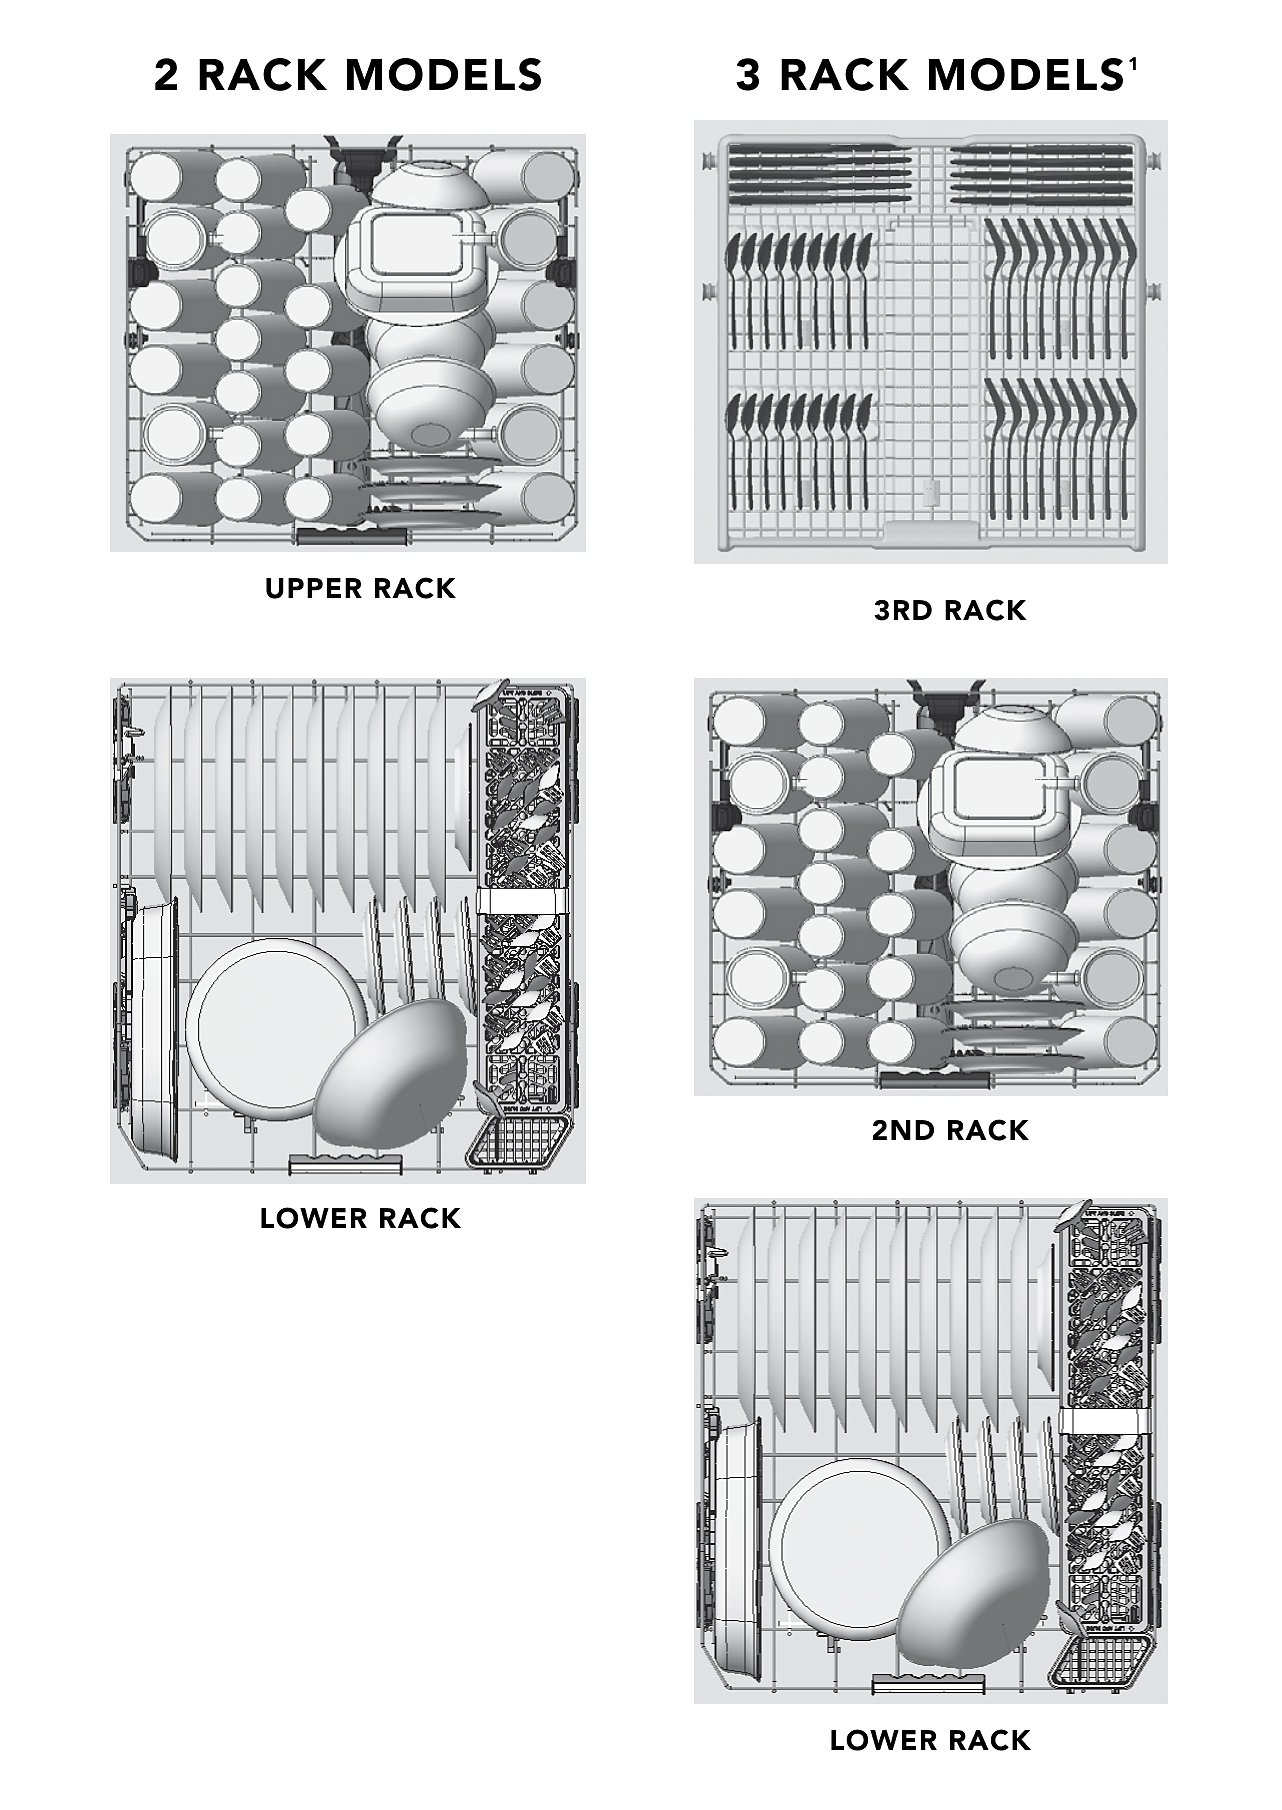 Illustration of a properly loaded dishwasher